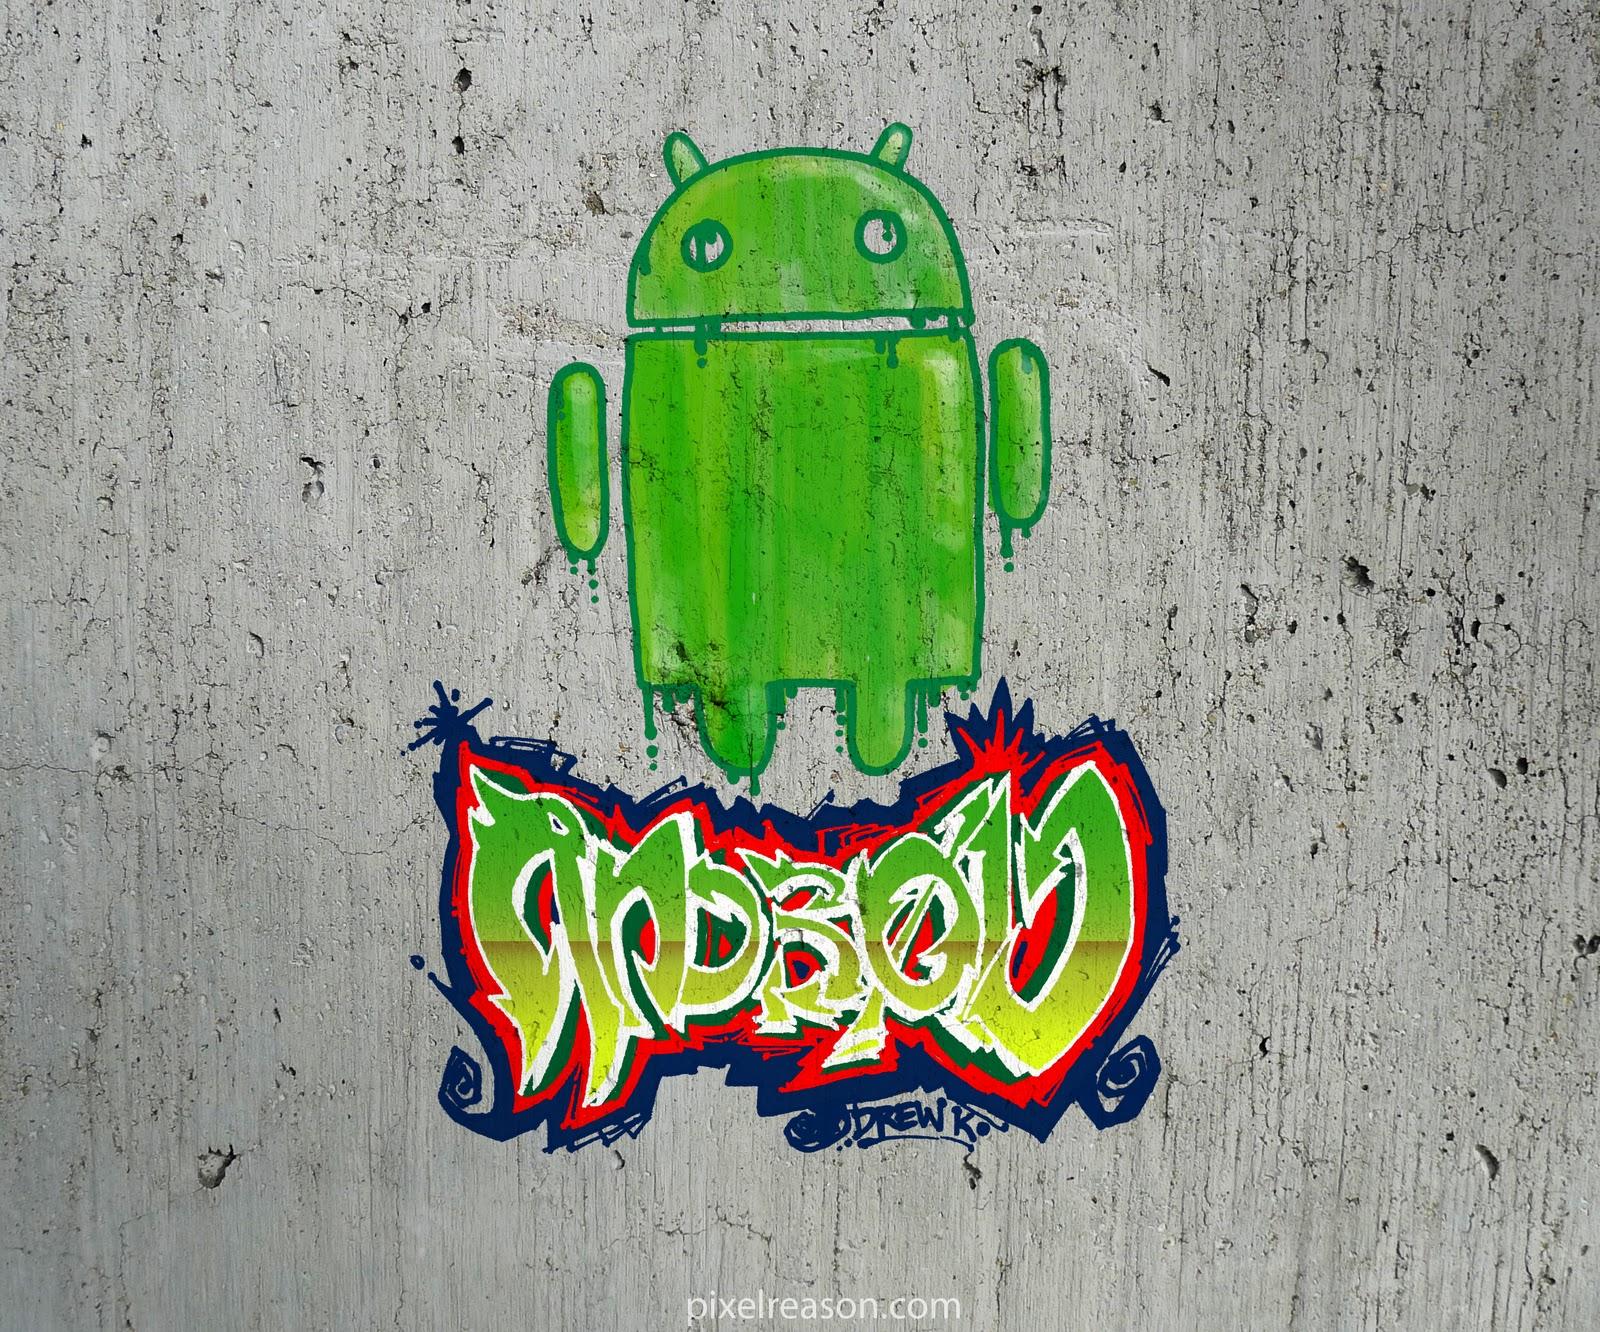 Inked Girl Hd Wallpaper Pixelreason Com Droid Does Graffiti Concrete Variant